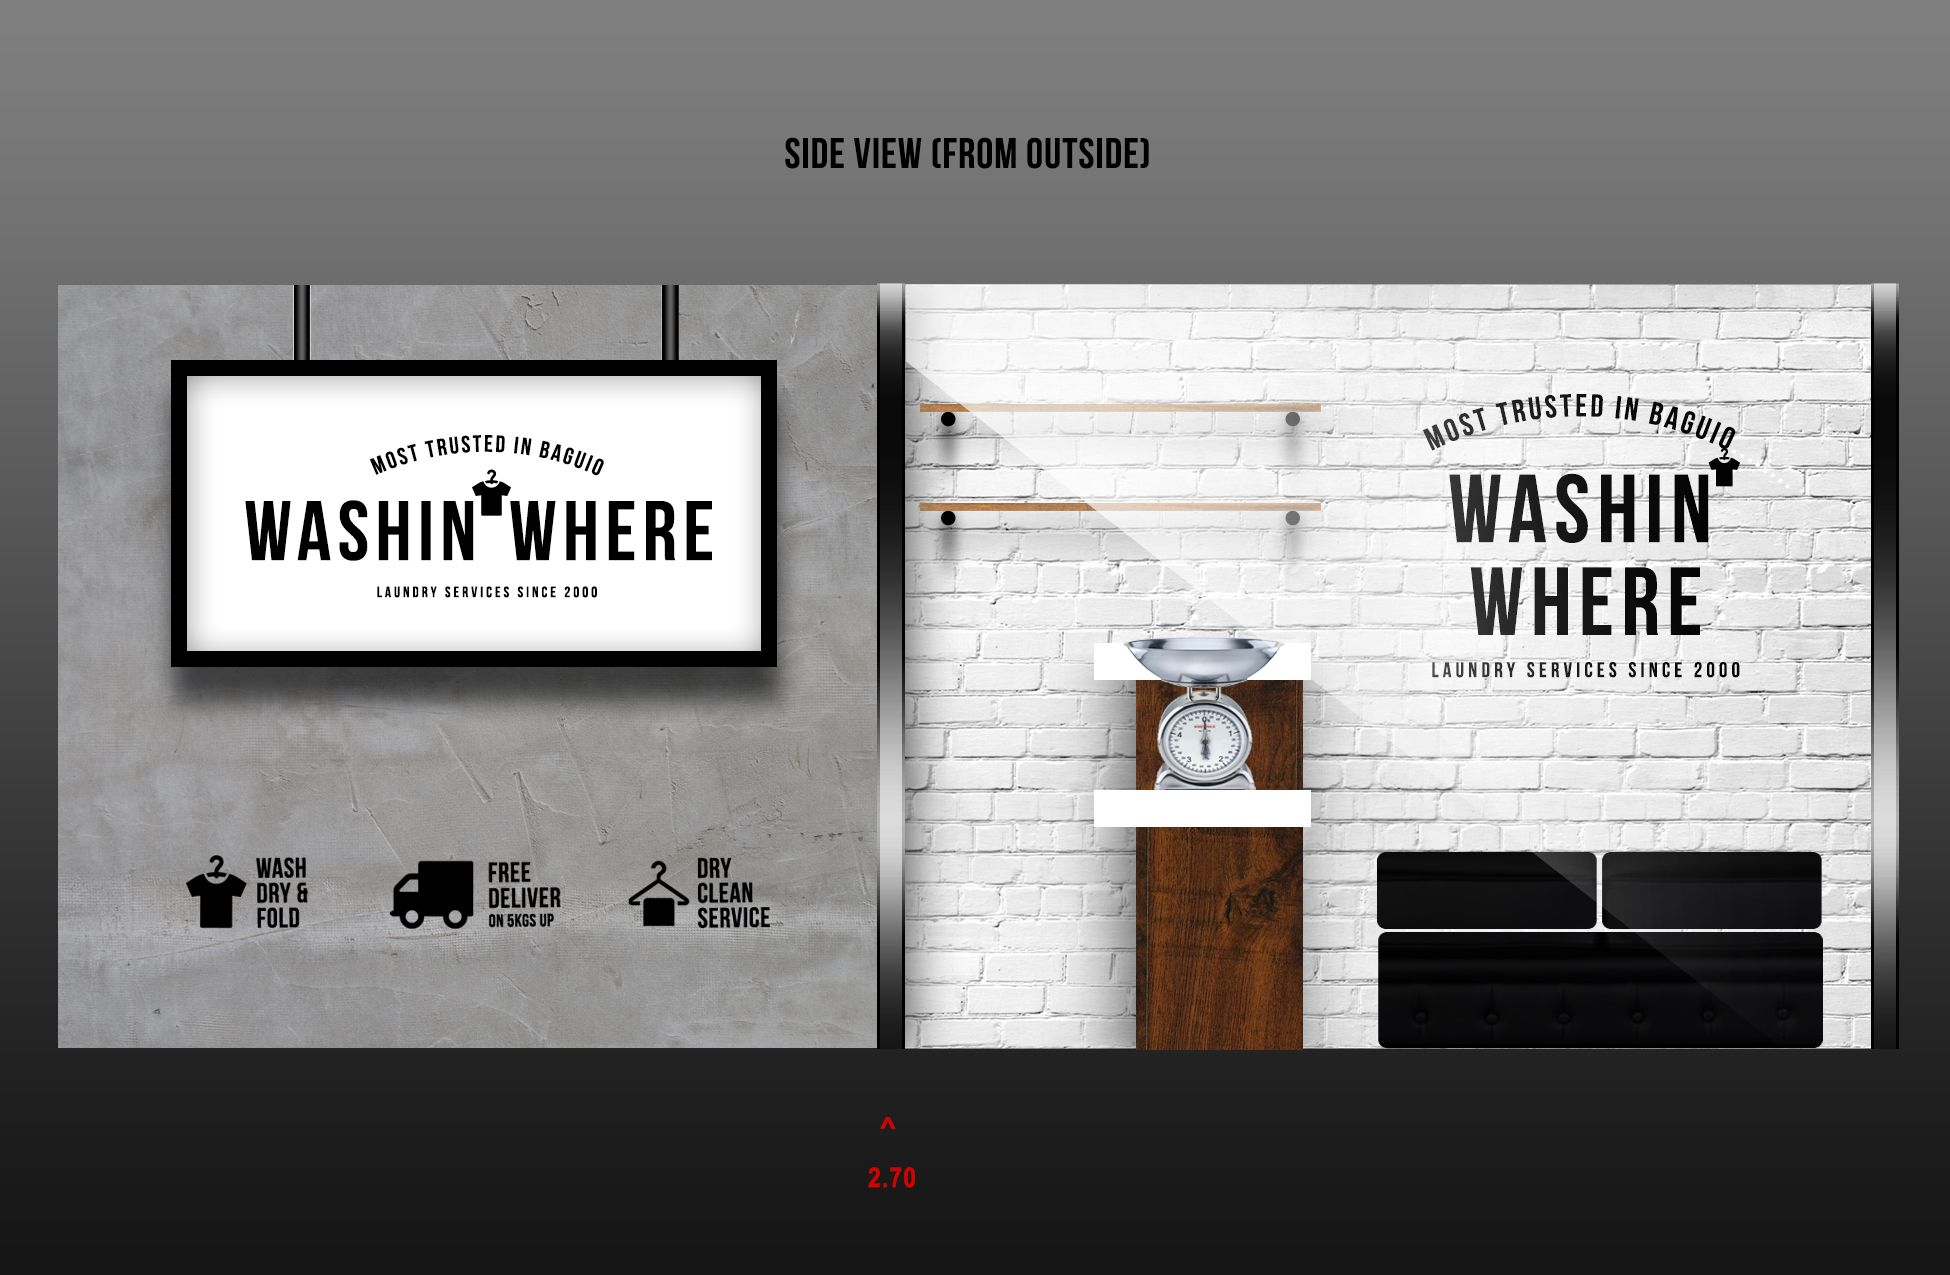 Washinwhere Laundry Shop New Store Visualization Side Wall